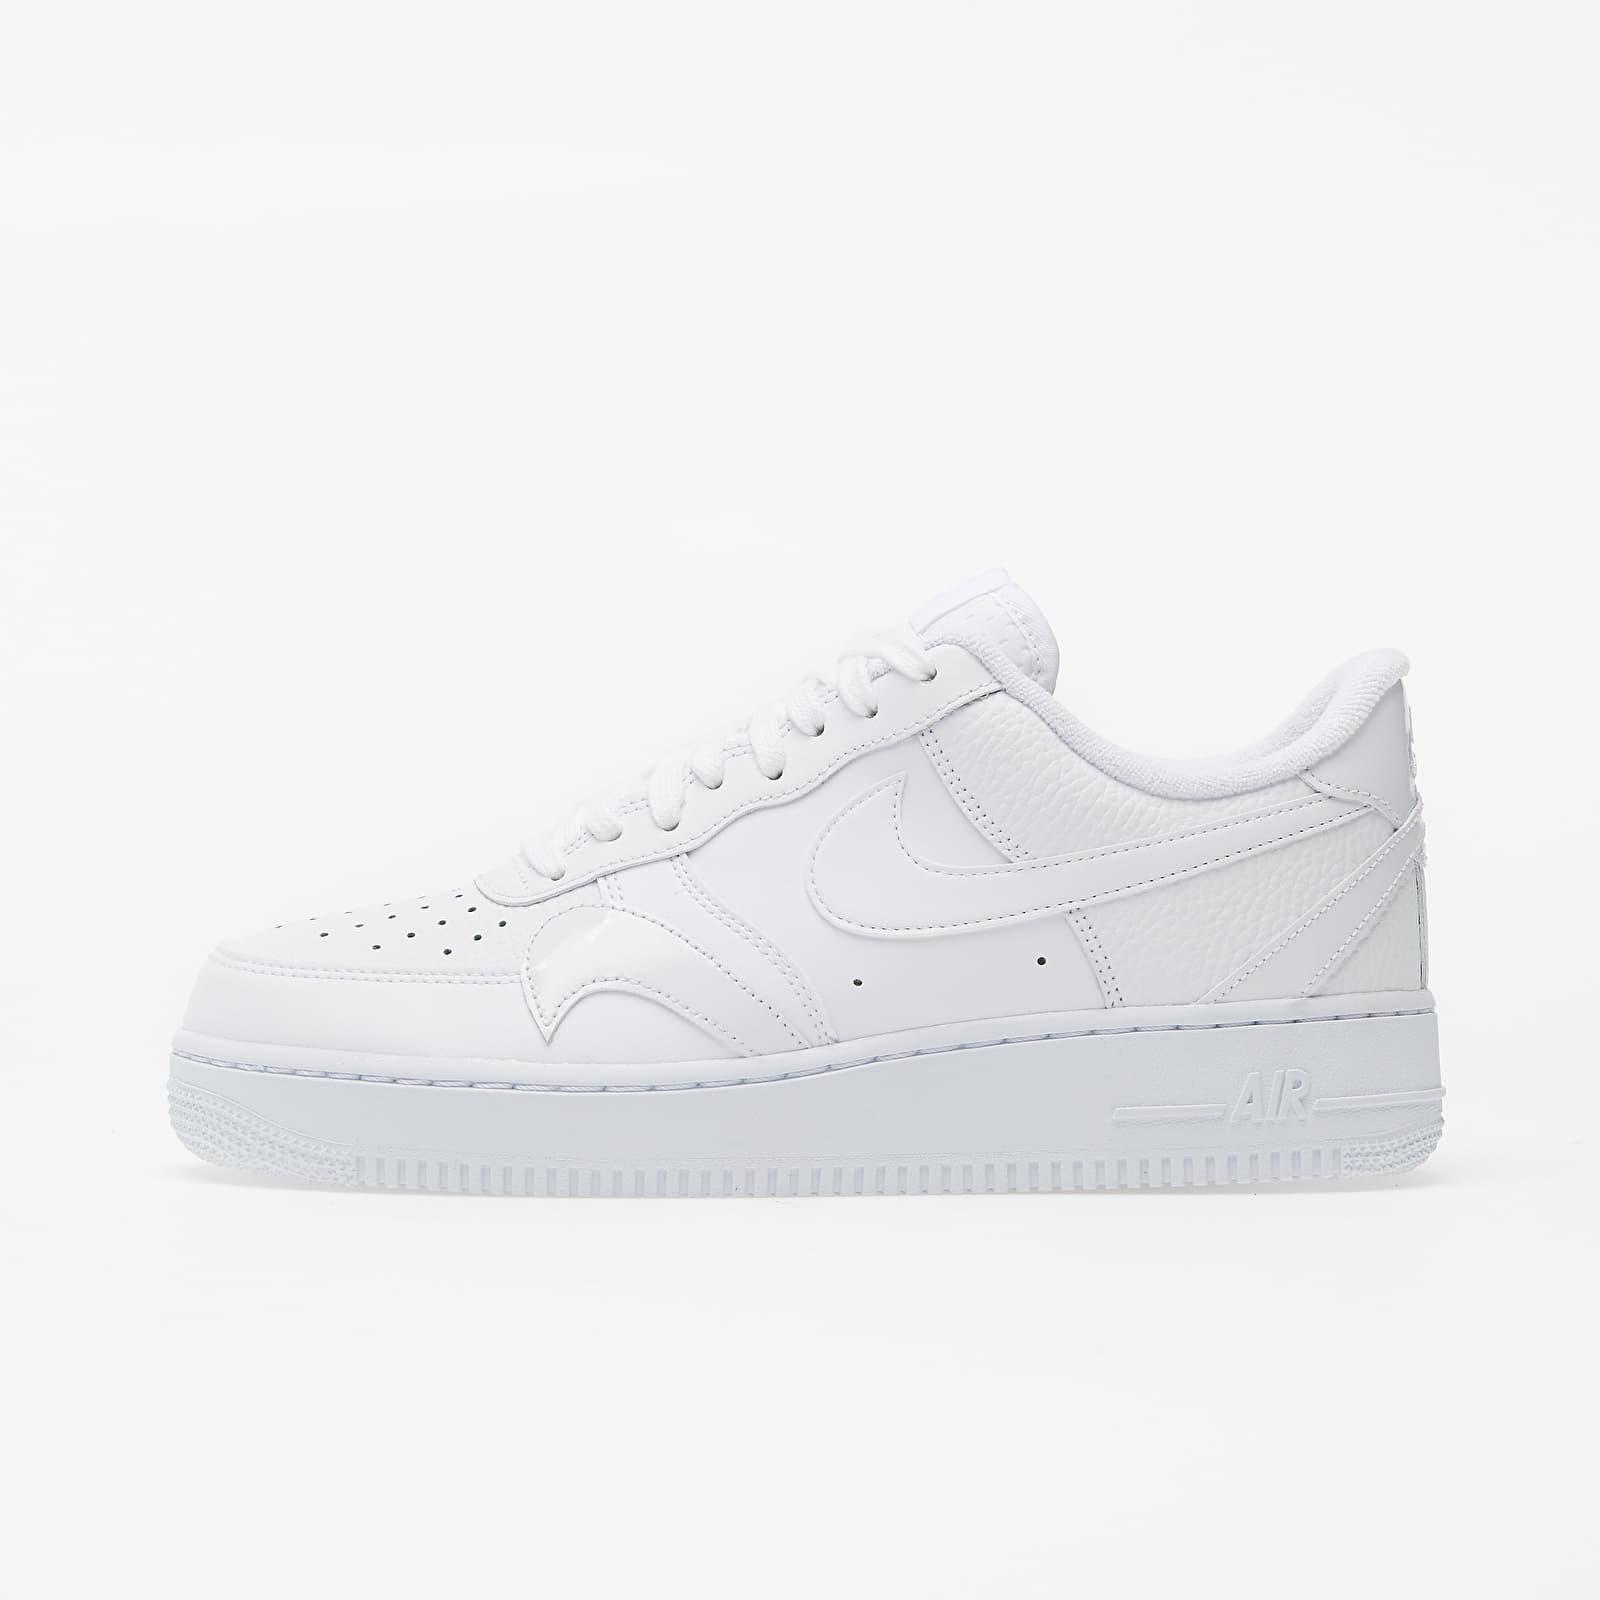 Buty męskie Nike Air Force 1 '07 LV8 White/ White-White